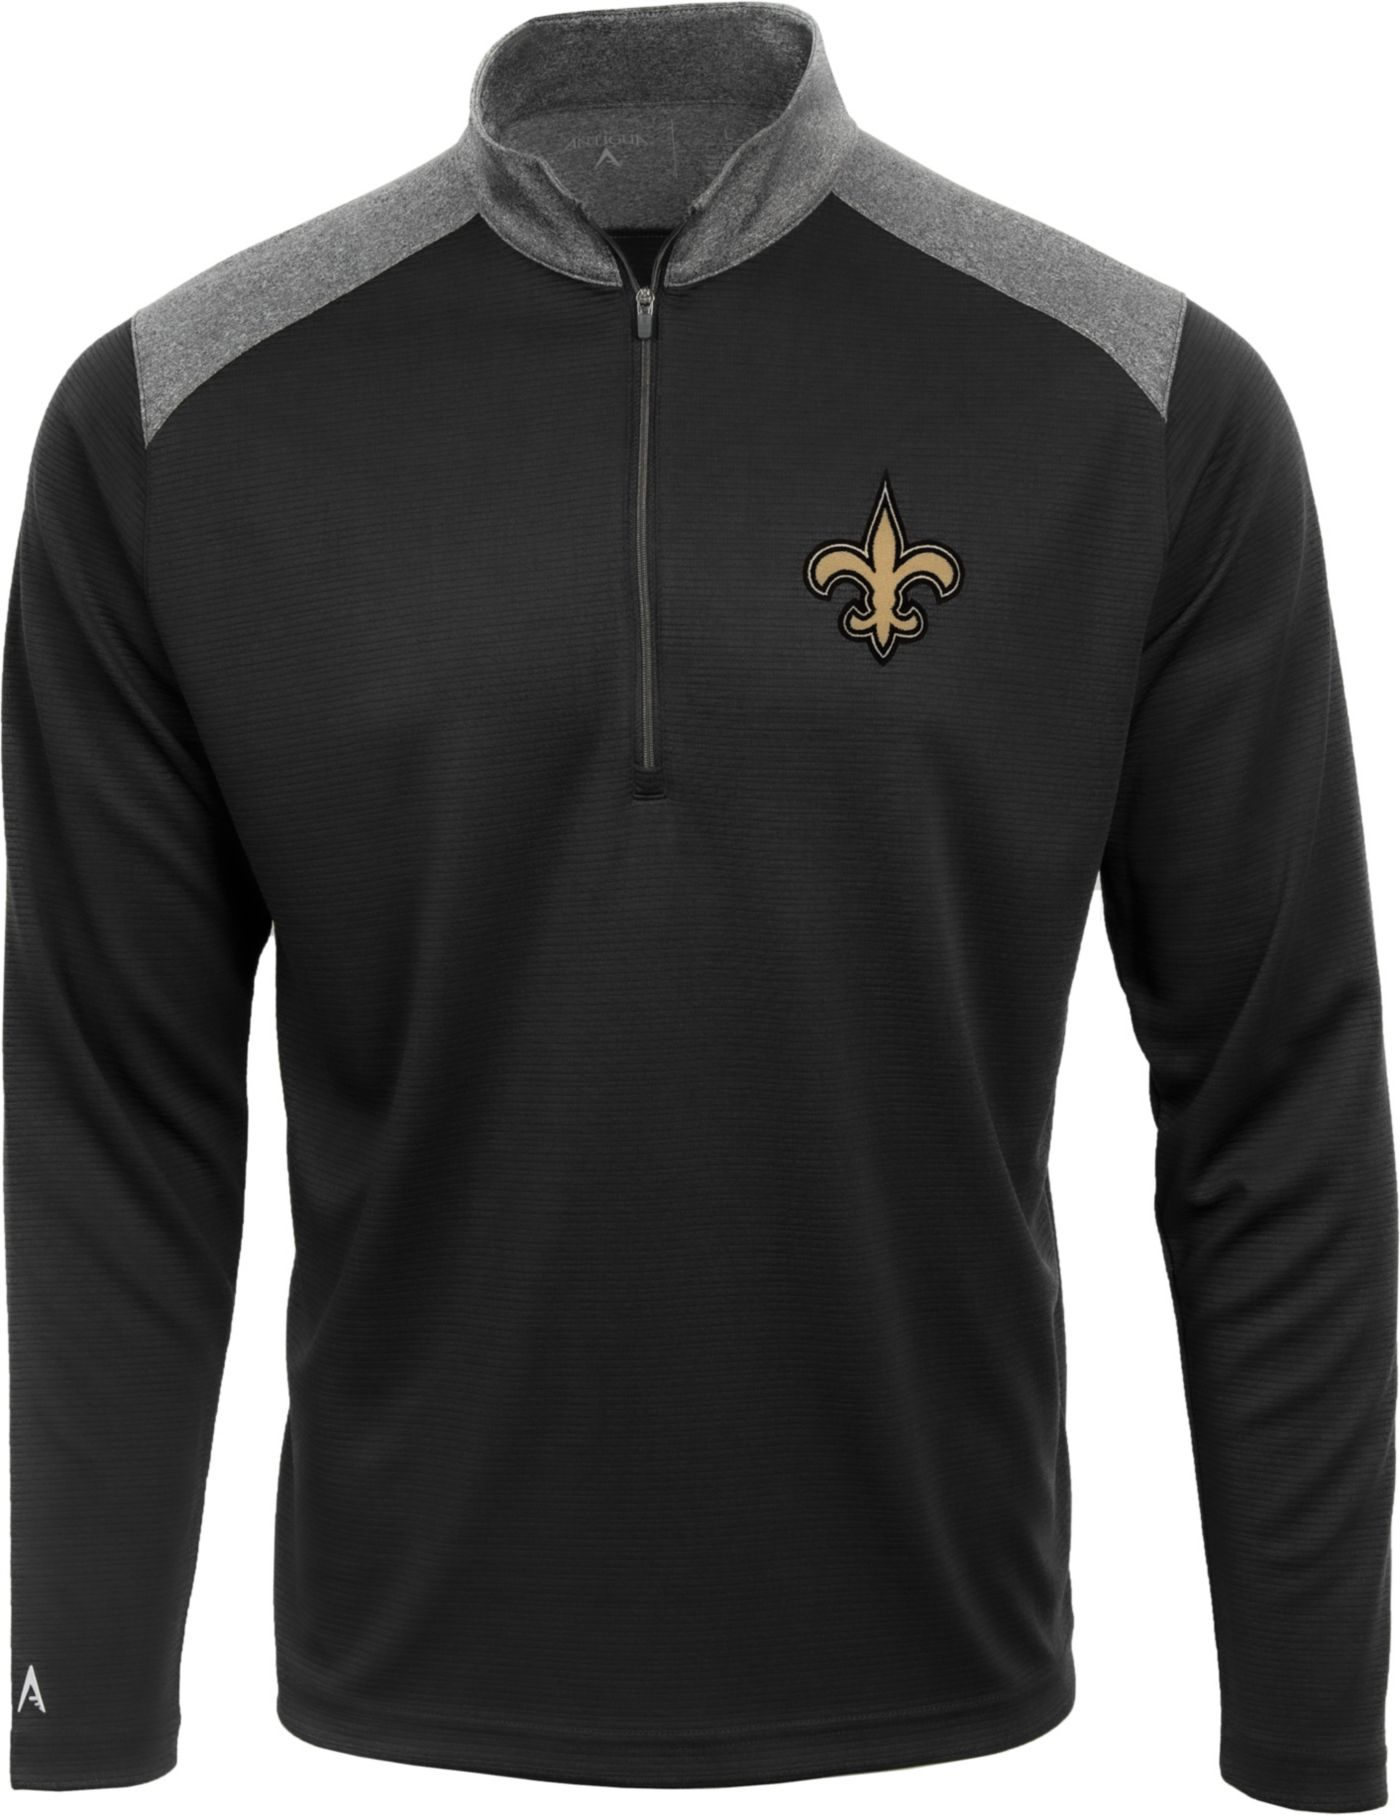 Antigua Men's New Orleans Saints Velocity Black Quarter-Zip Pullover